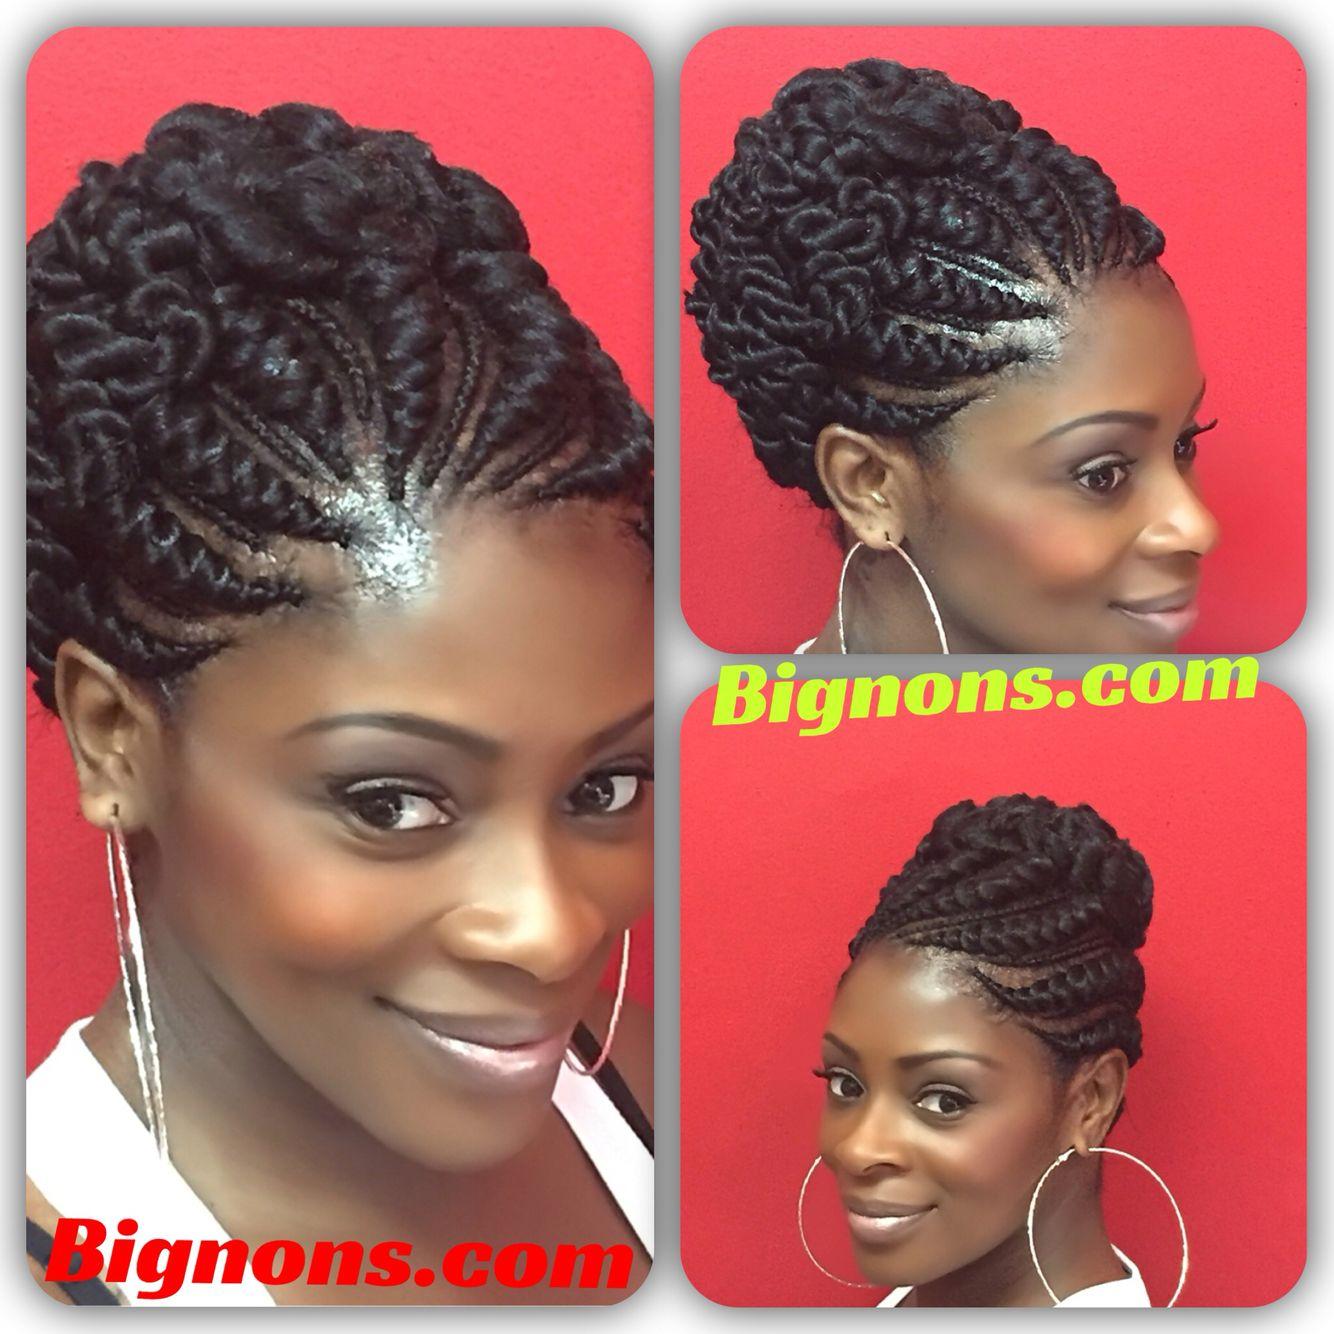 Bignonus african hair braiding torssadee cornrow wedding hairstyle